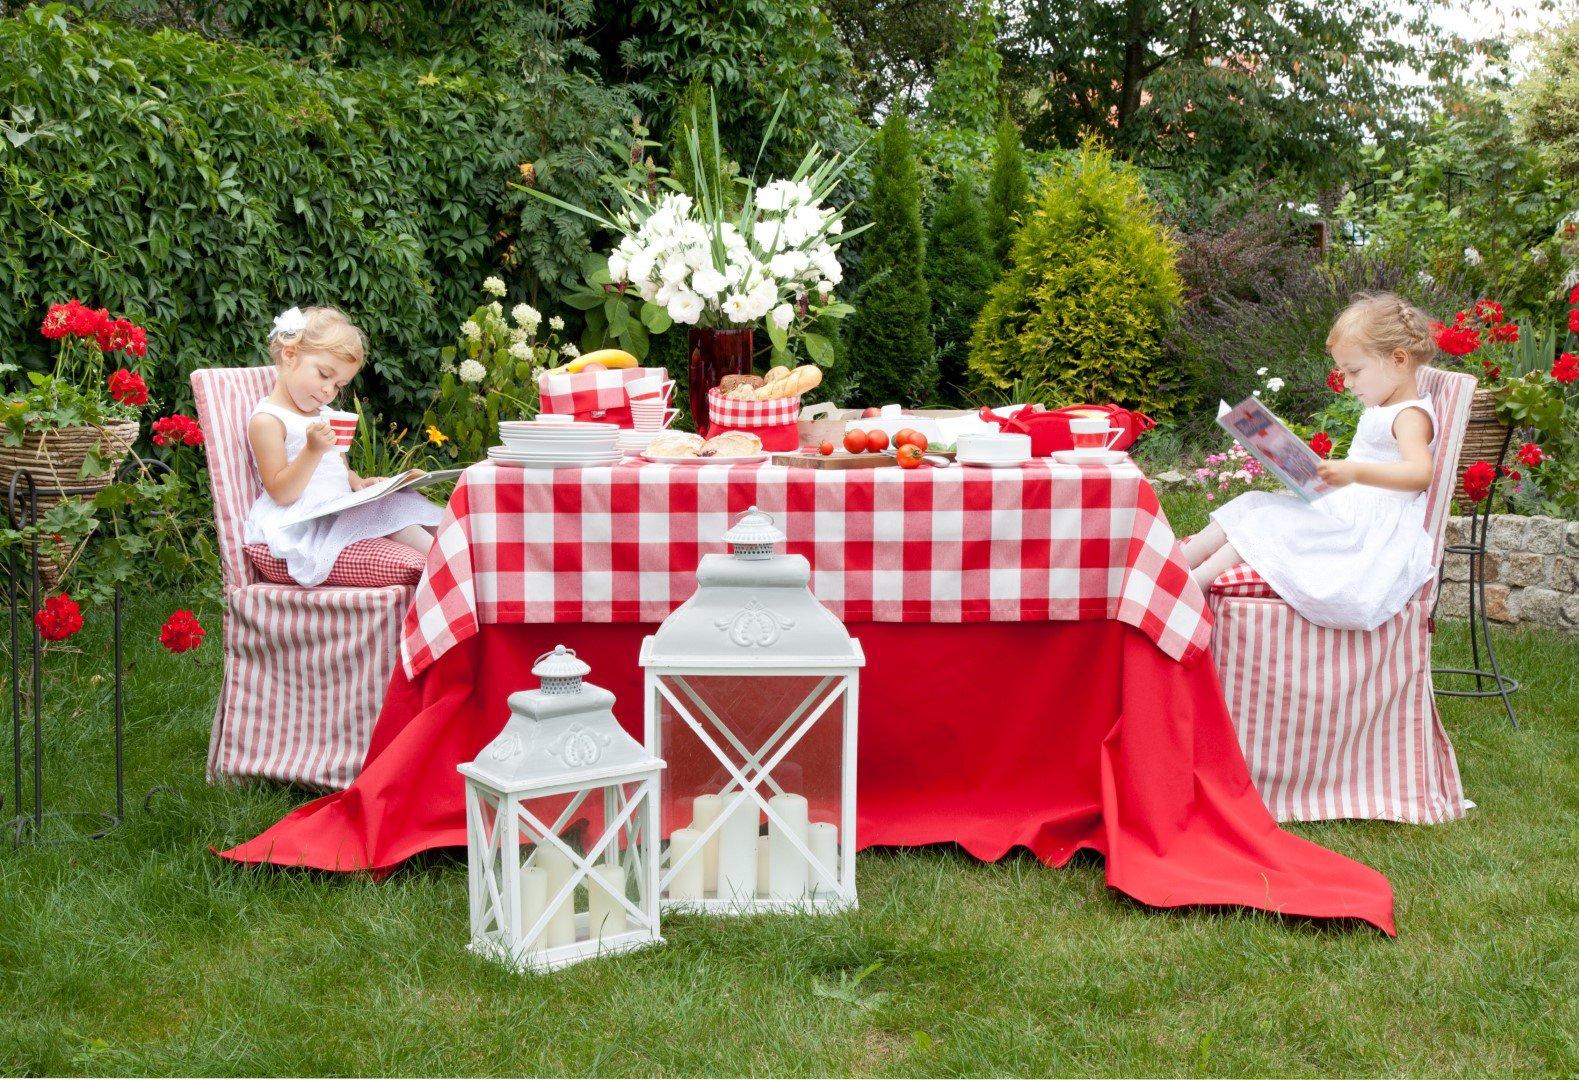 Garden Red & White Gingham Check